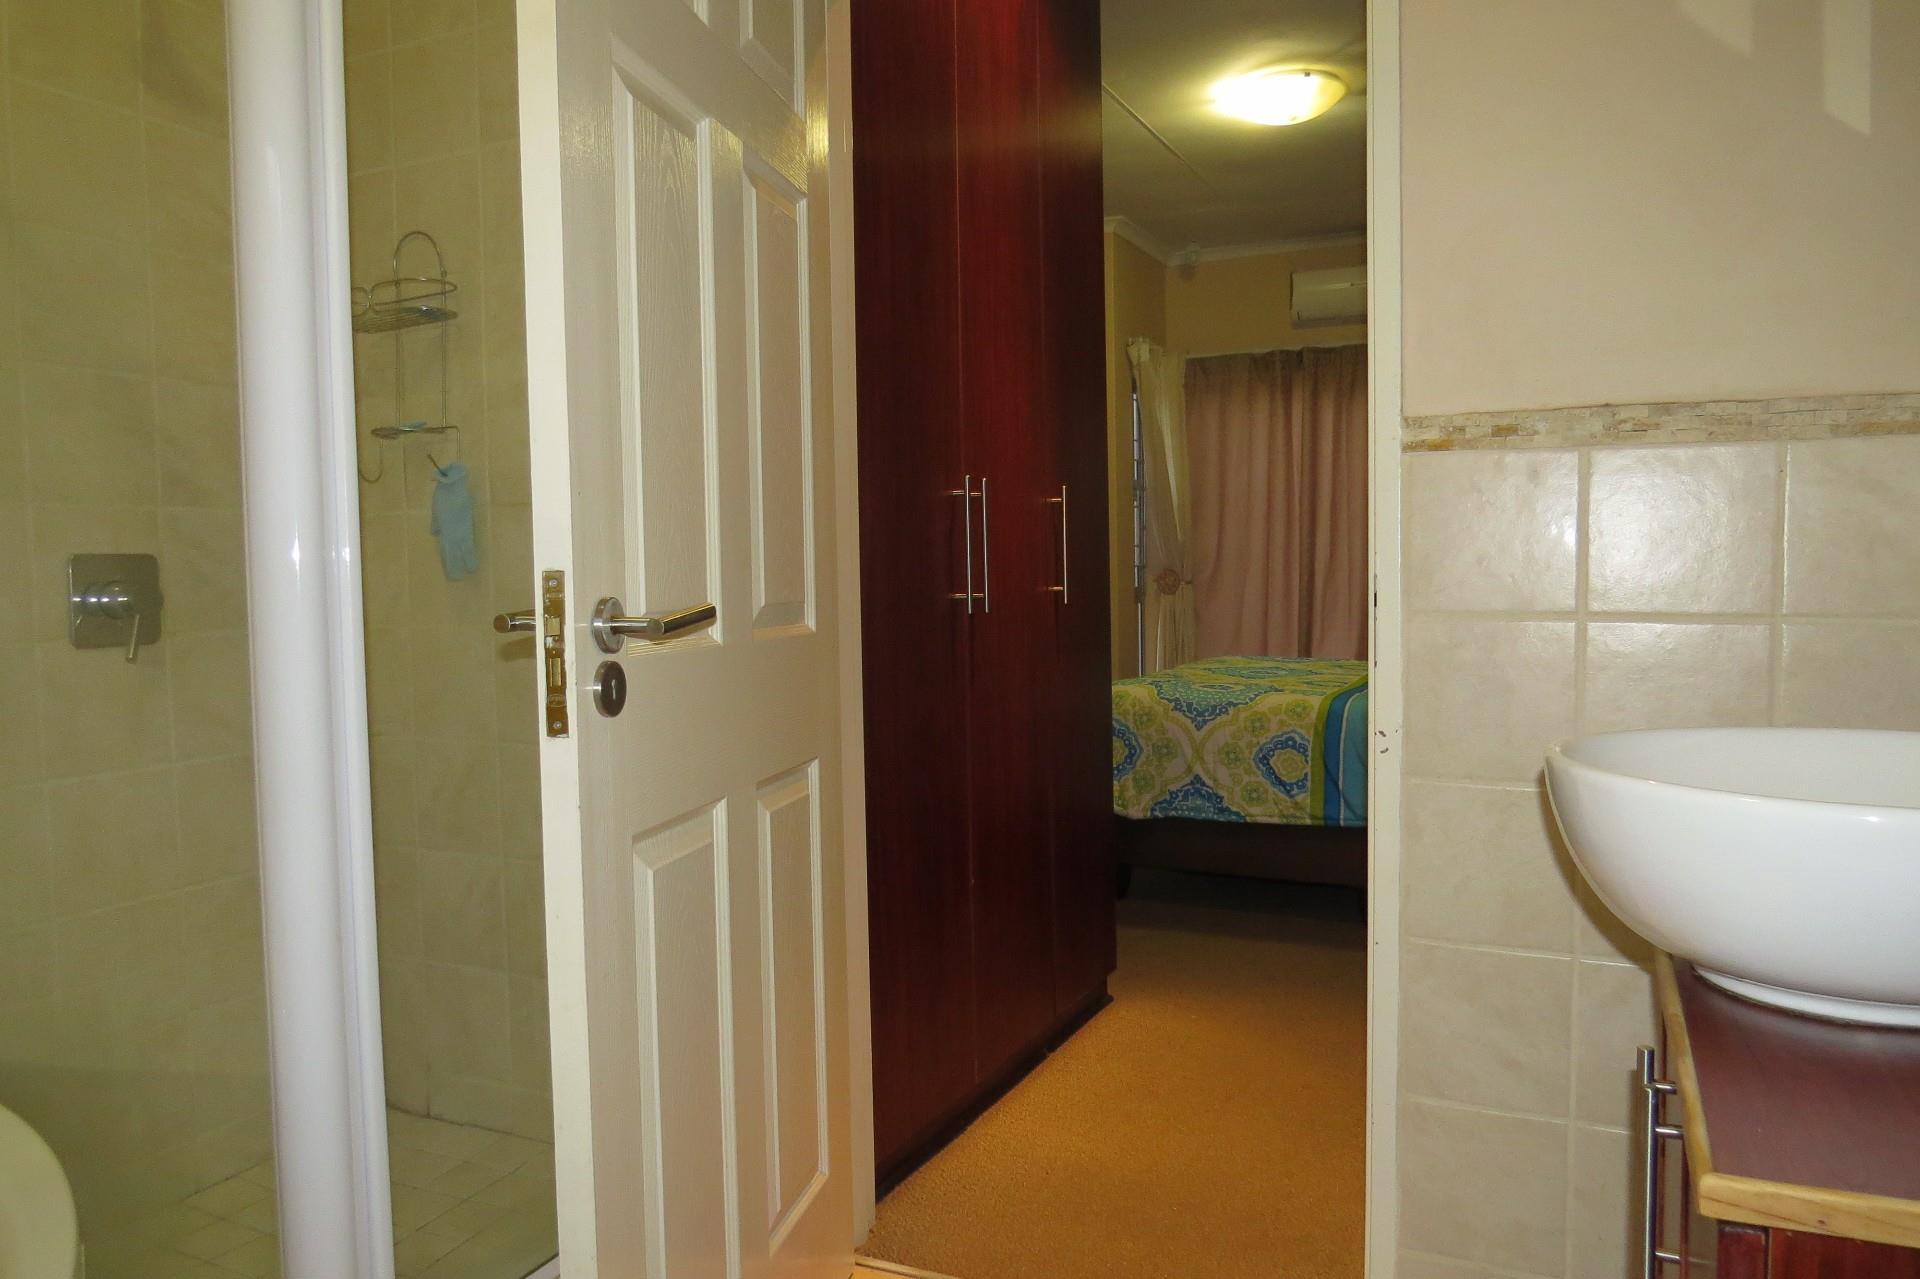 2 Bedroom Town house For Sale in Rhodesdene